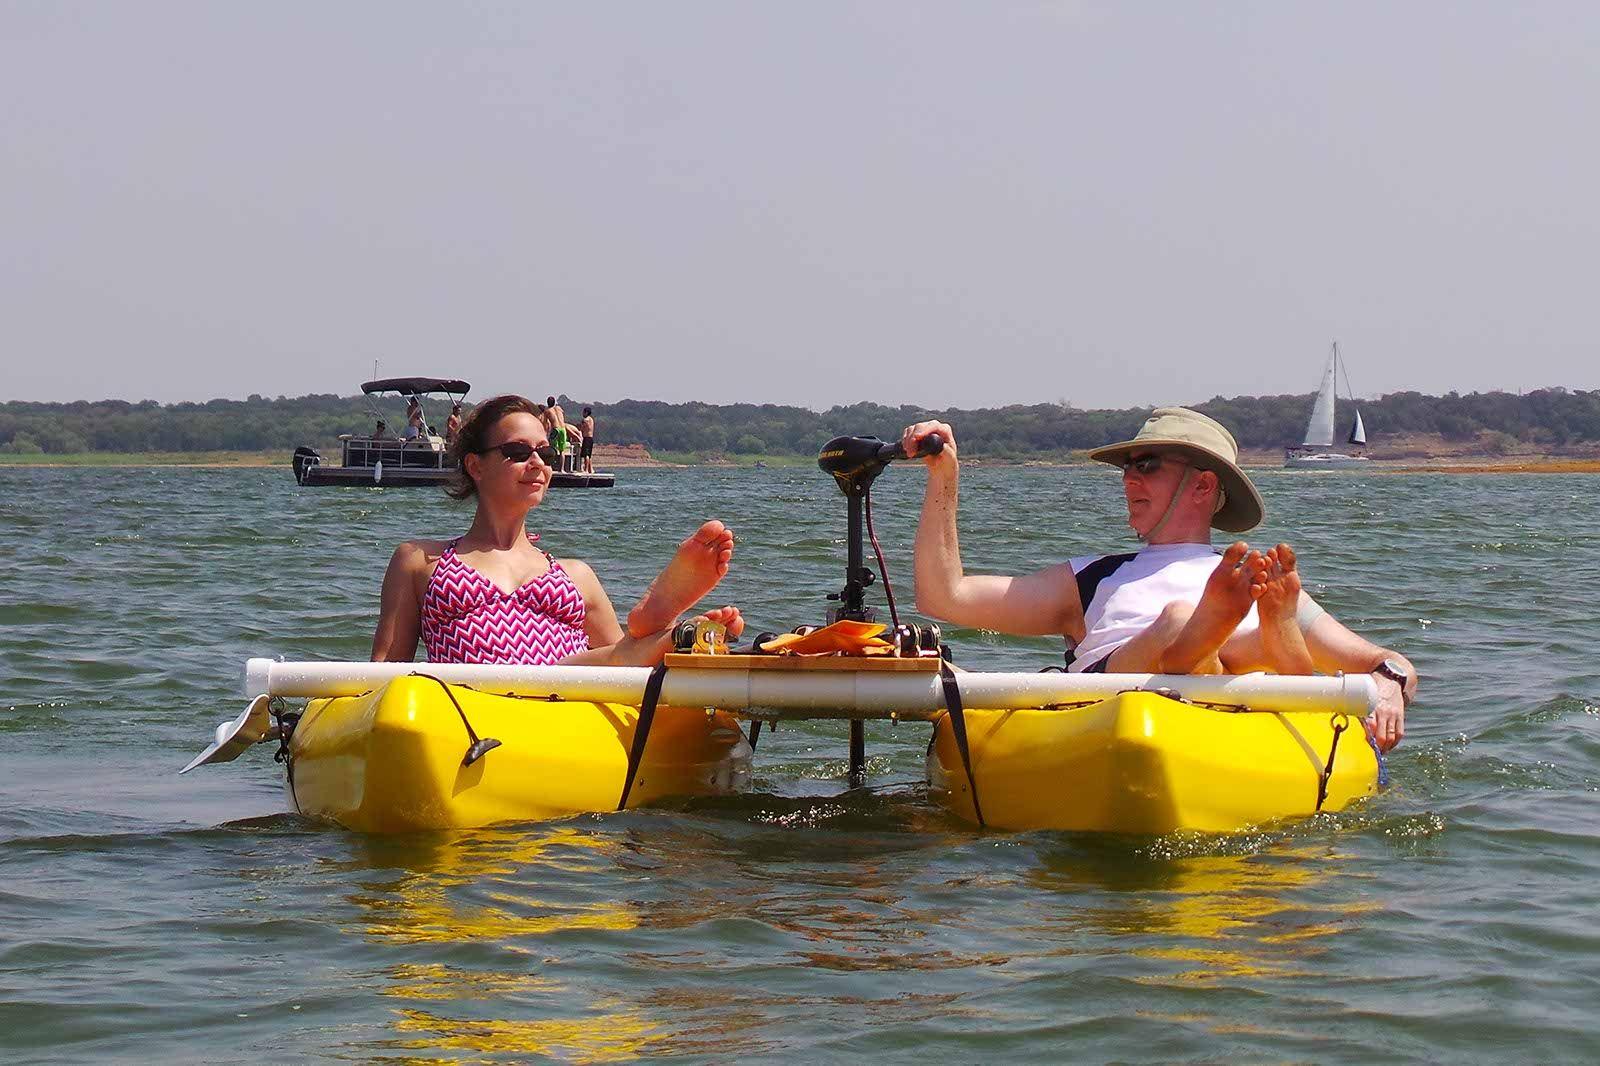 Rafting on Chusovaya on kayaks and catamarans: route, reviews 90